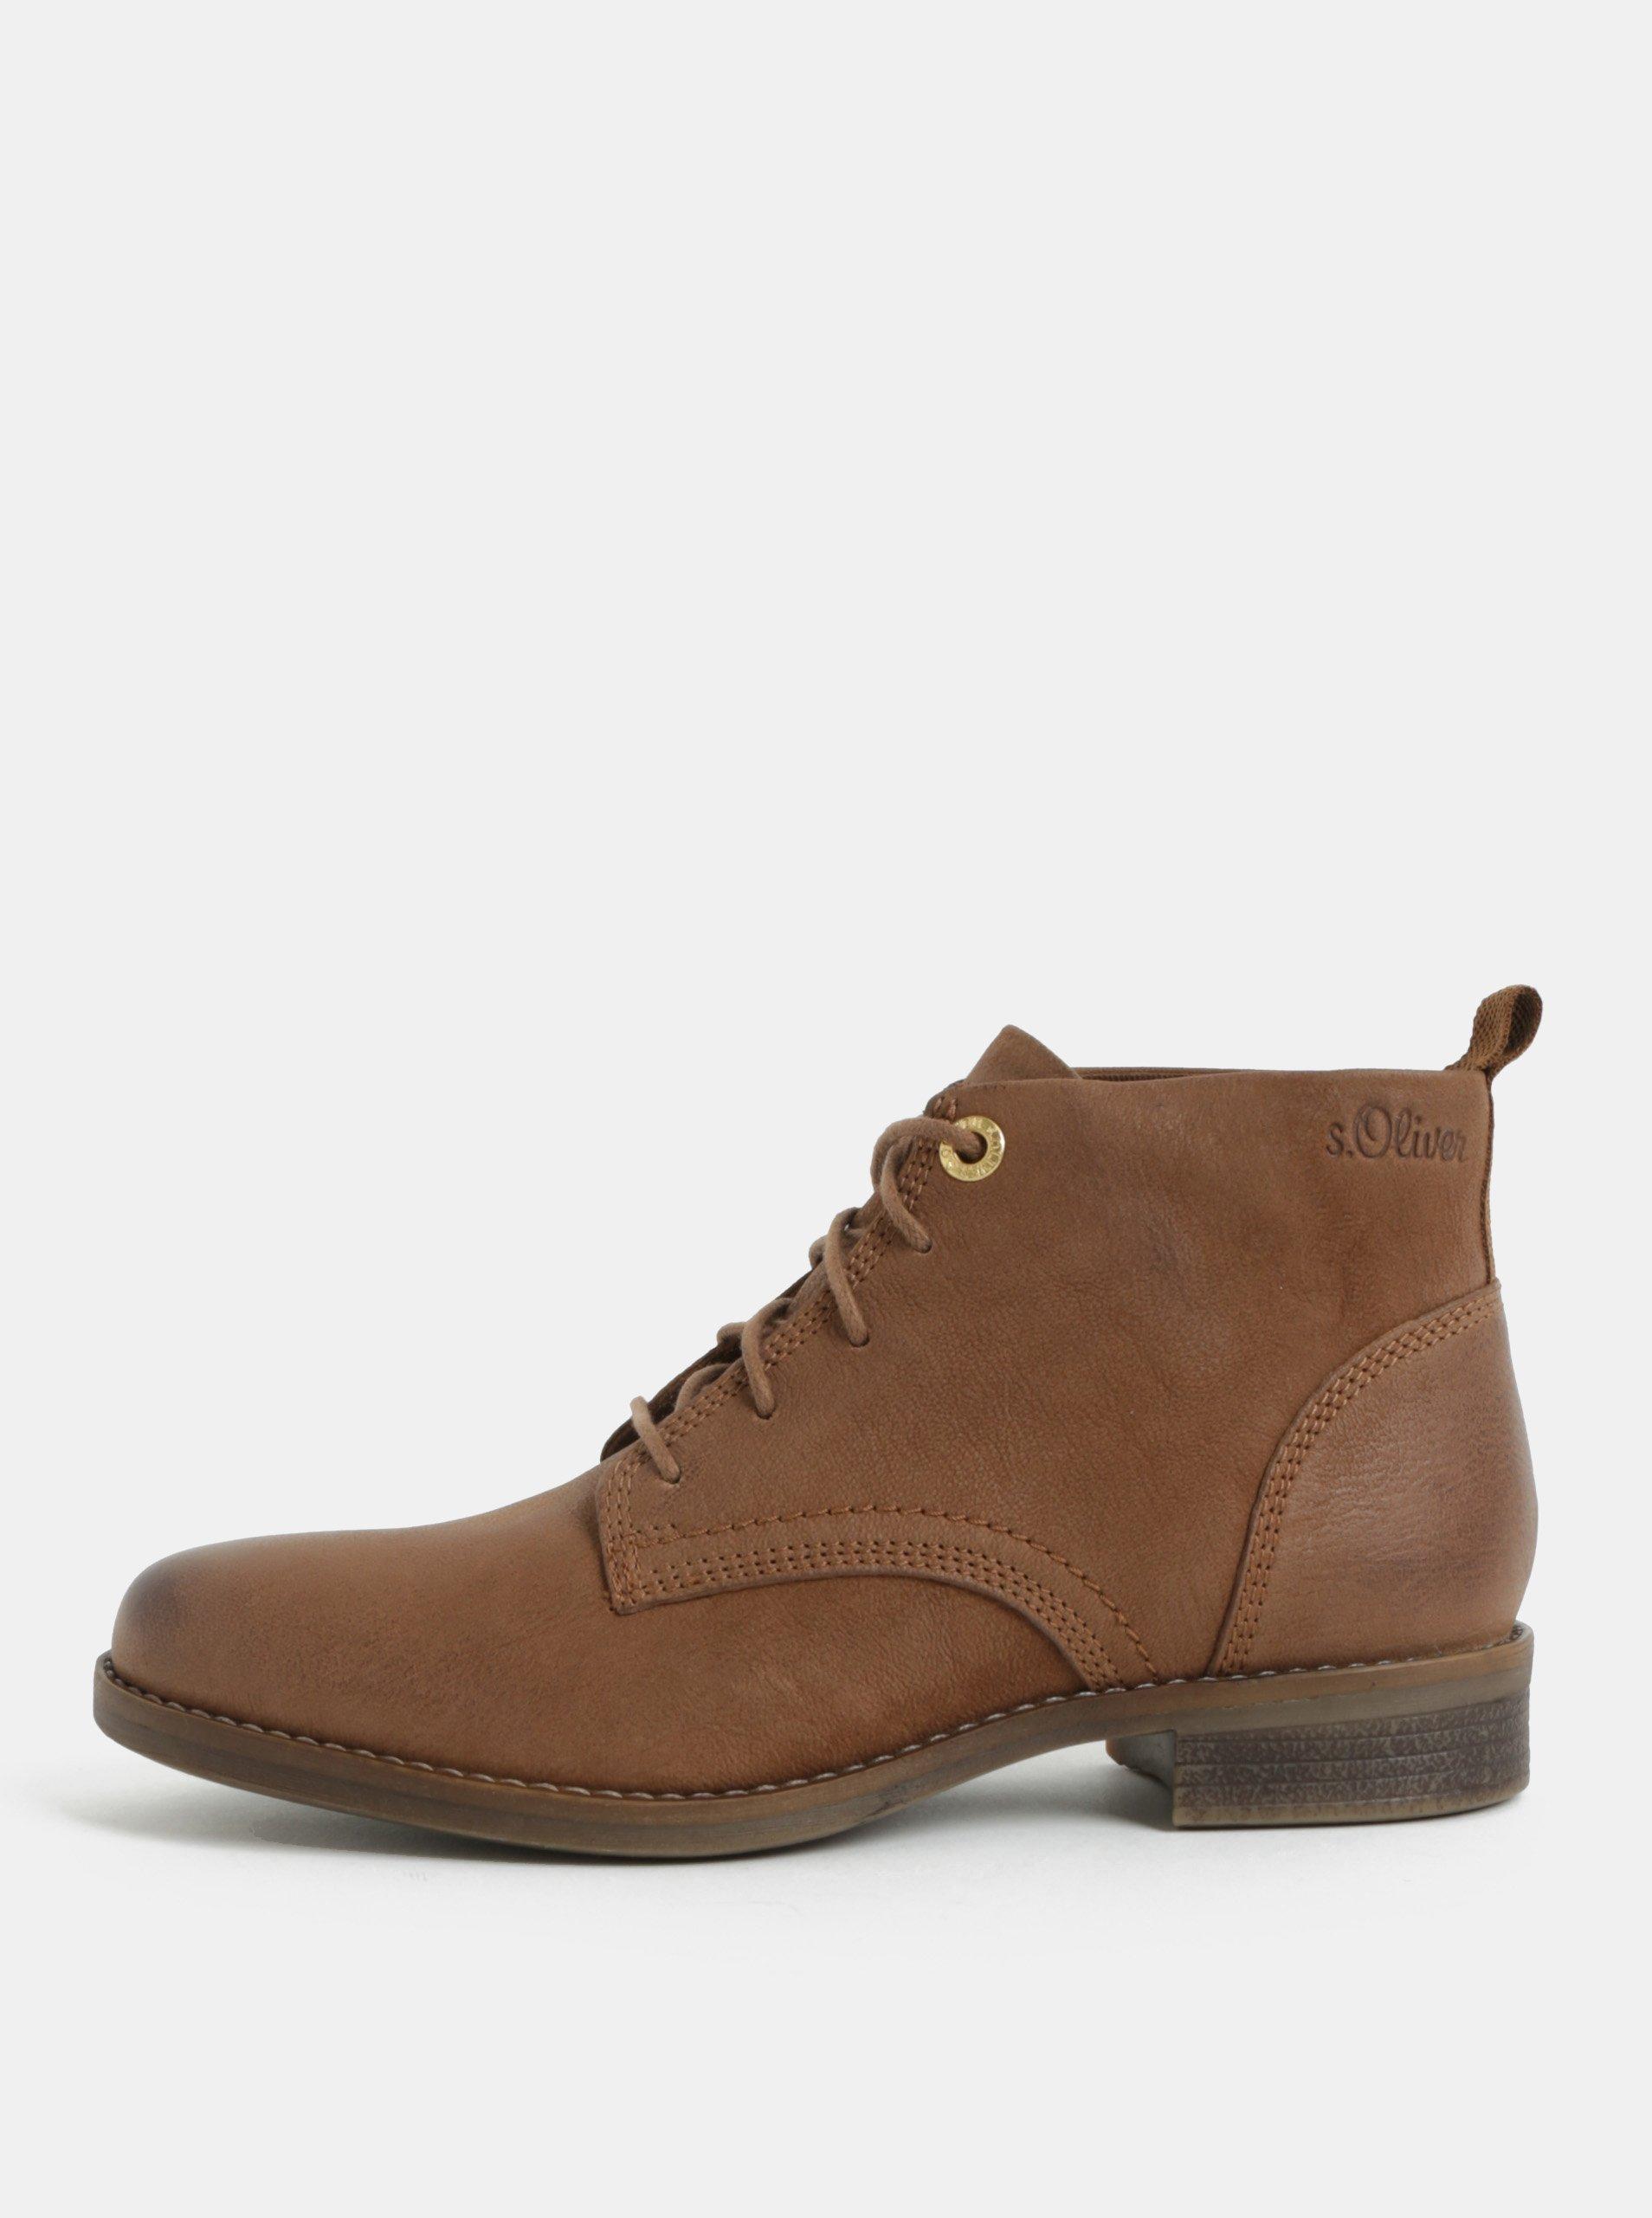 Hnedé kožené členkové topánky s.Oliver